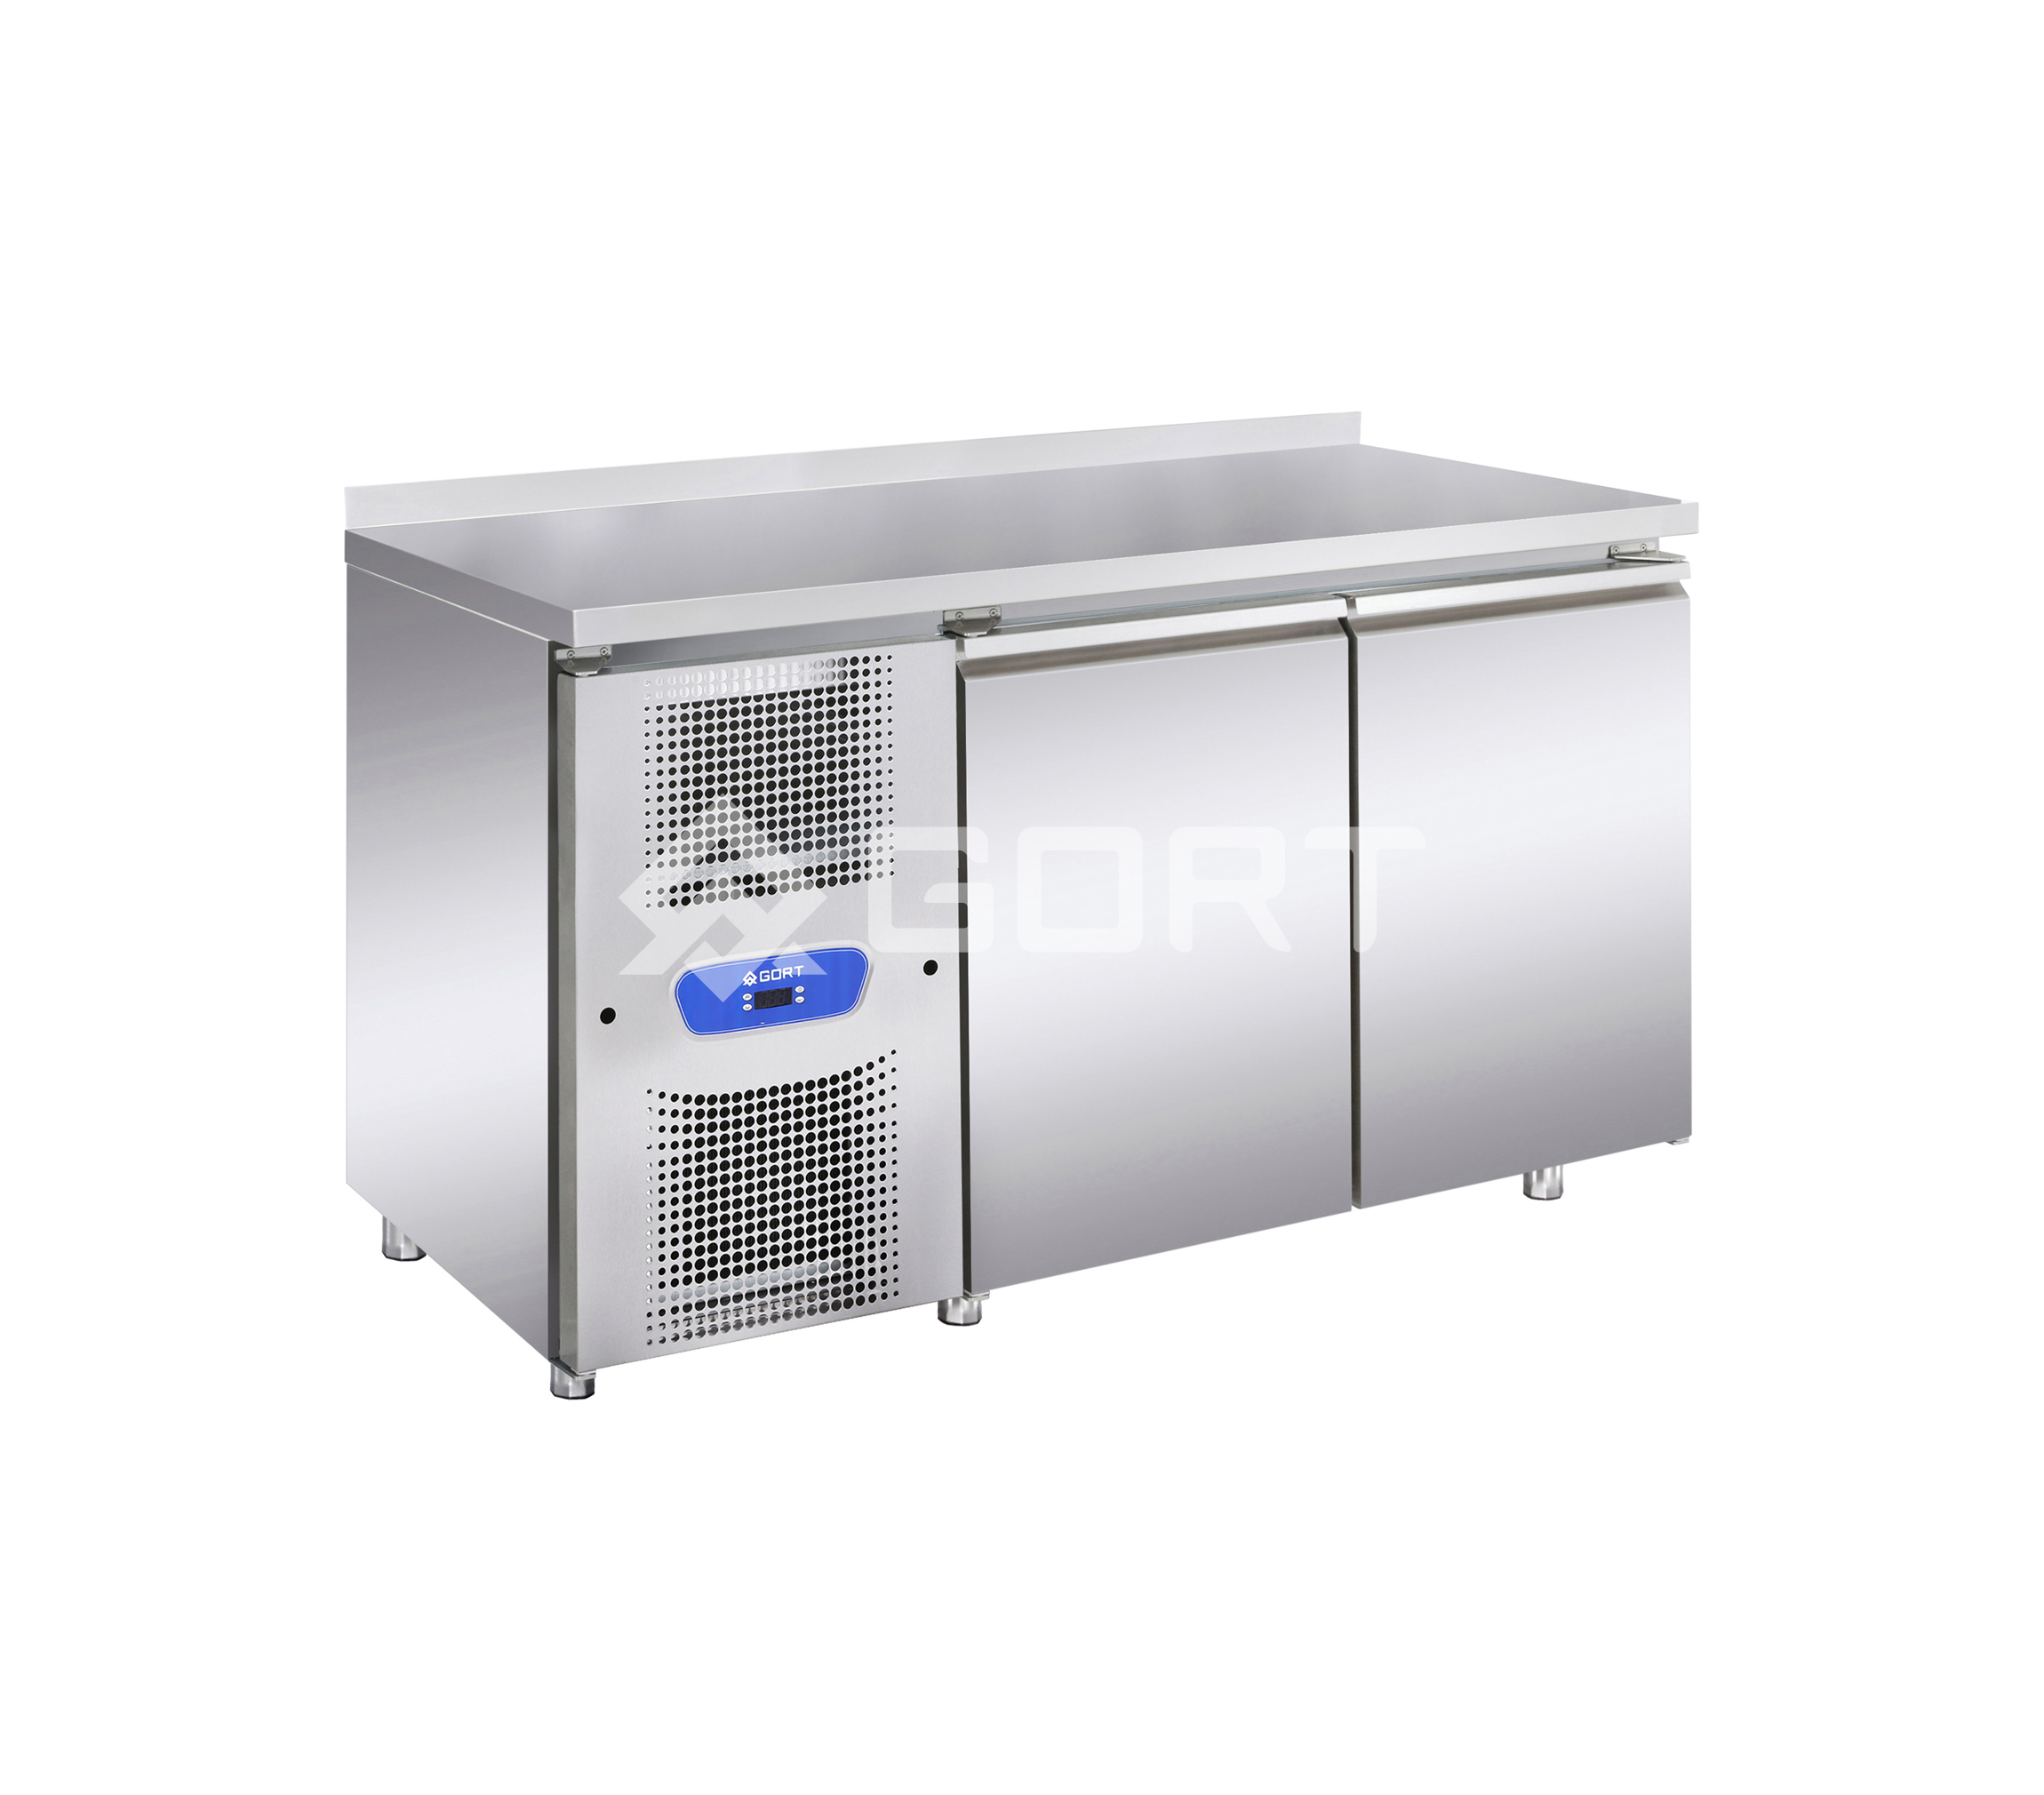 2 door refrigerated counter GN1/1